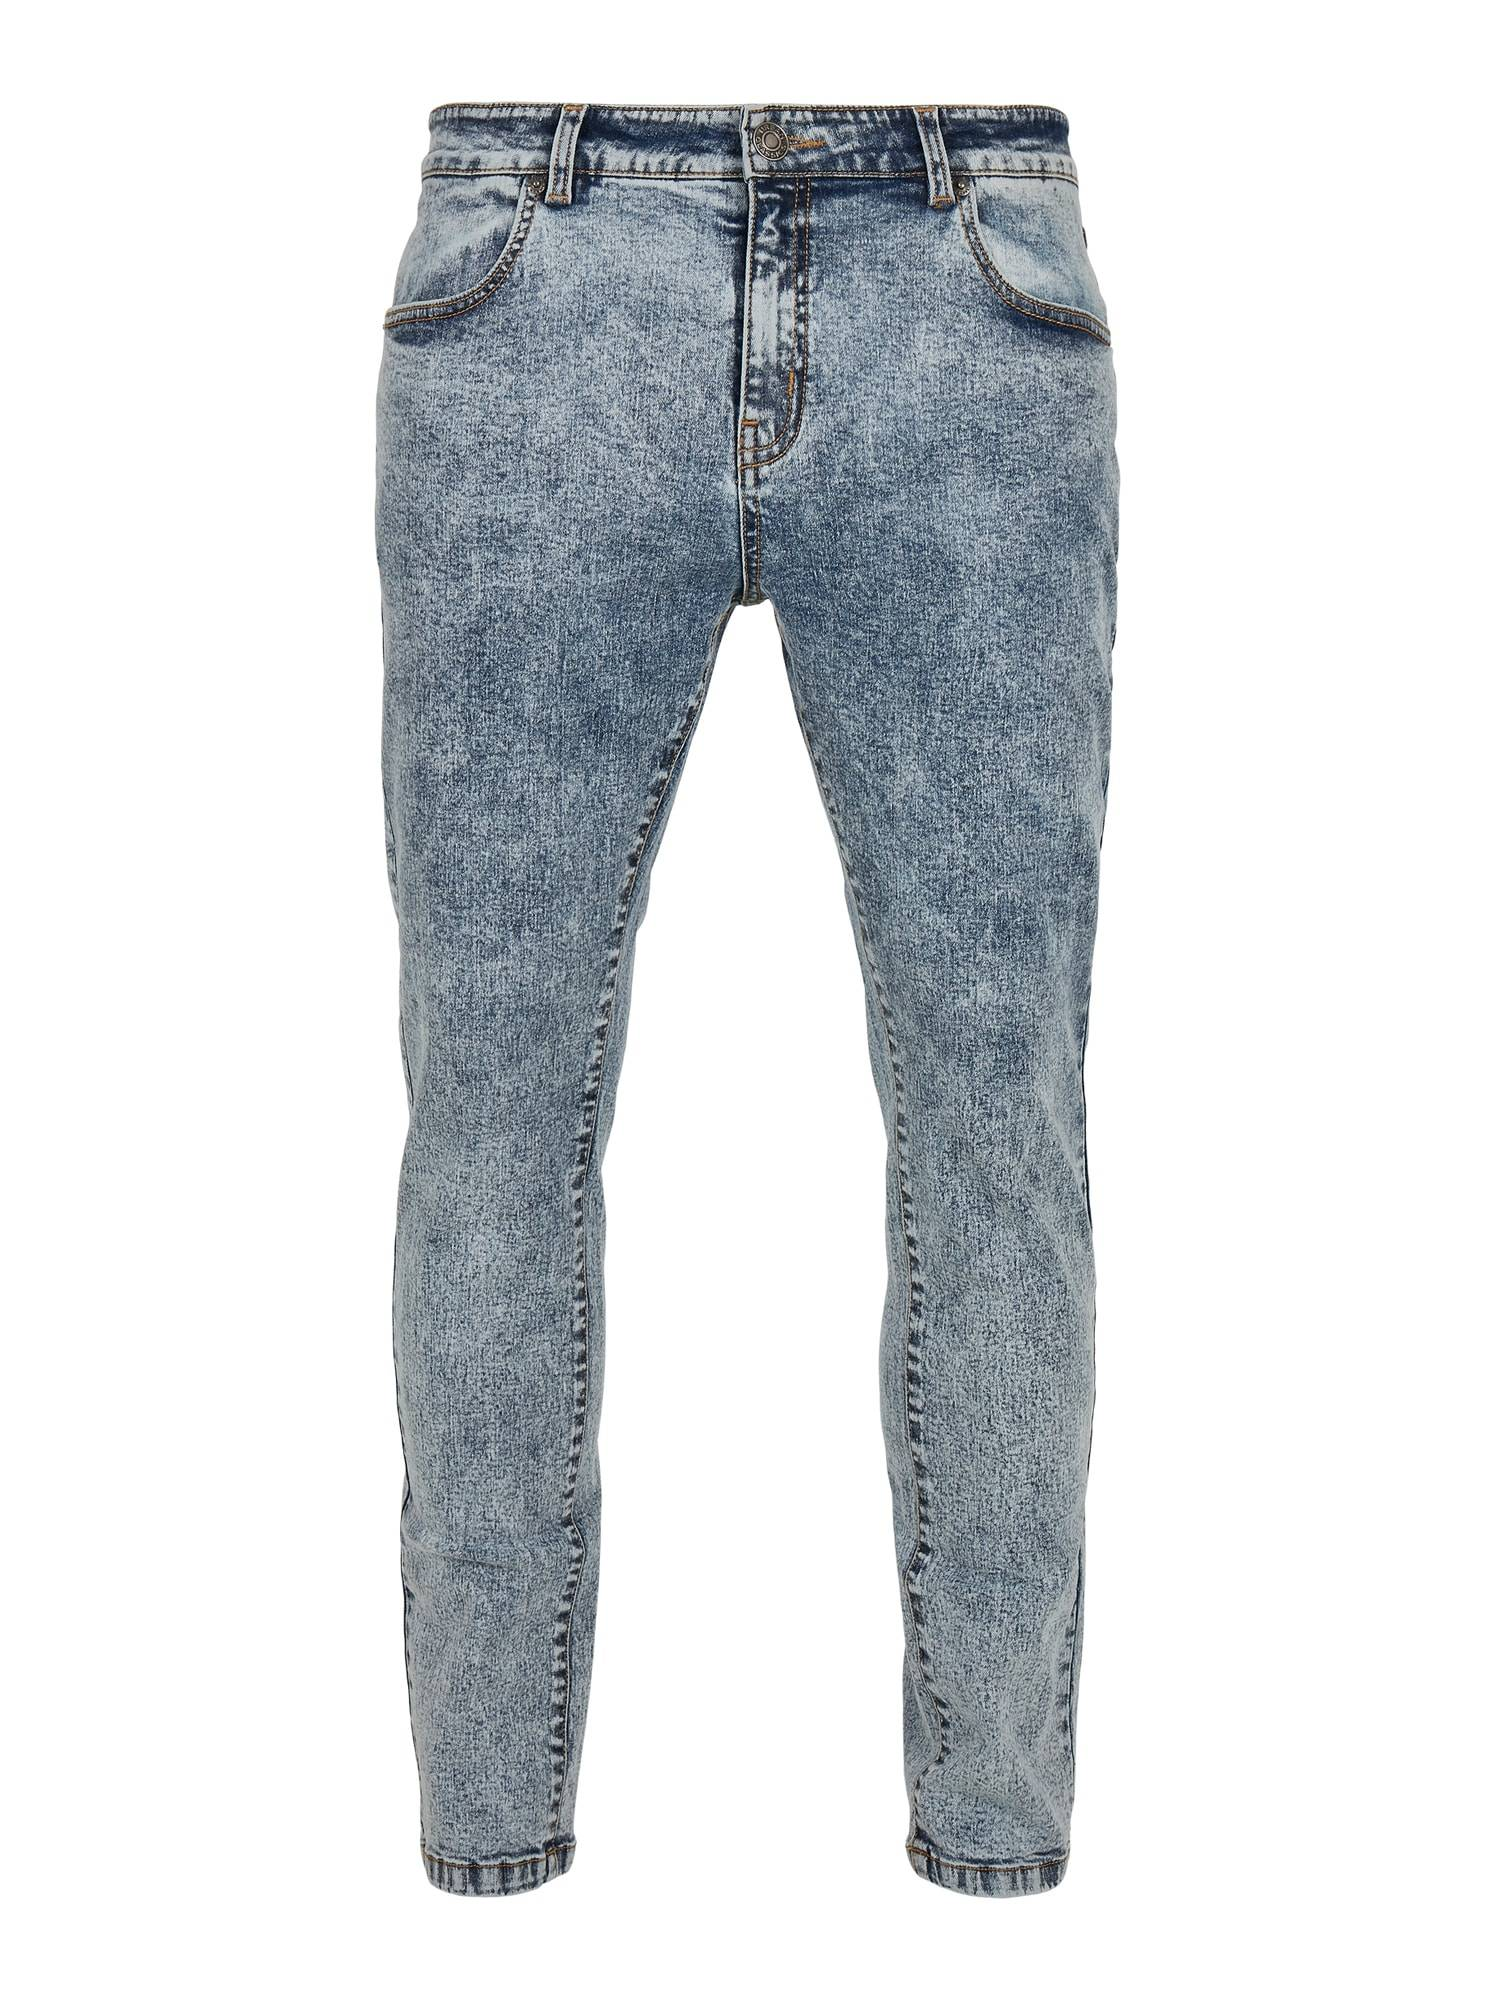 Urban Classics Jean  - Bleu - Taille: 31 - male